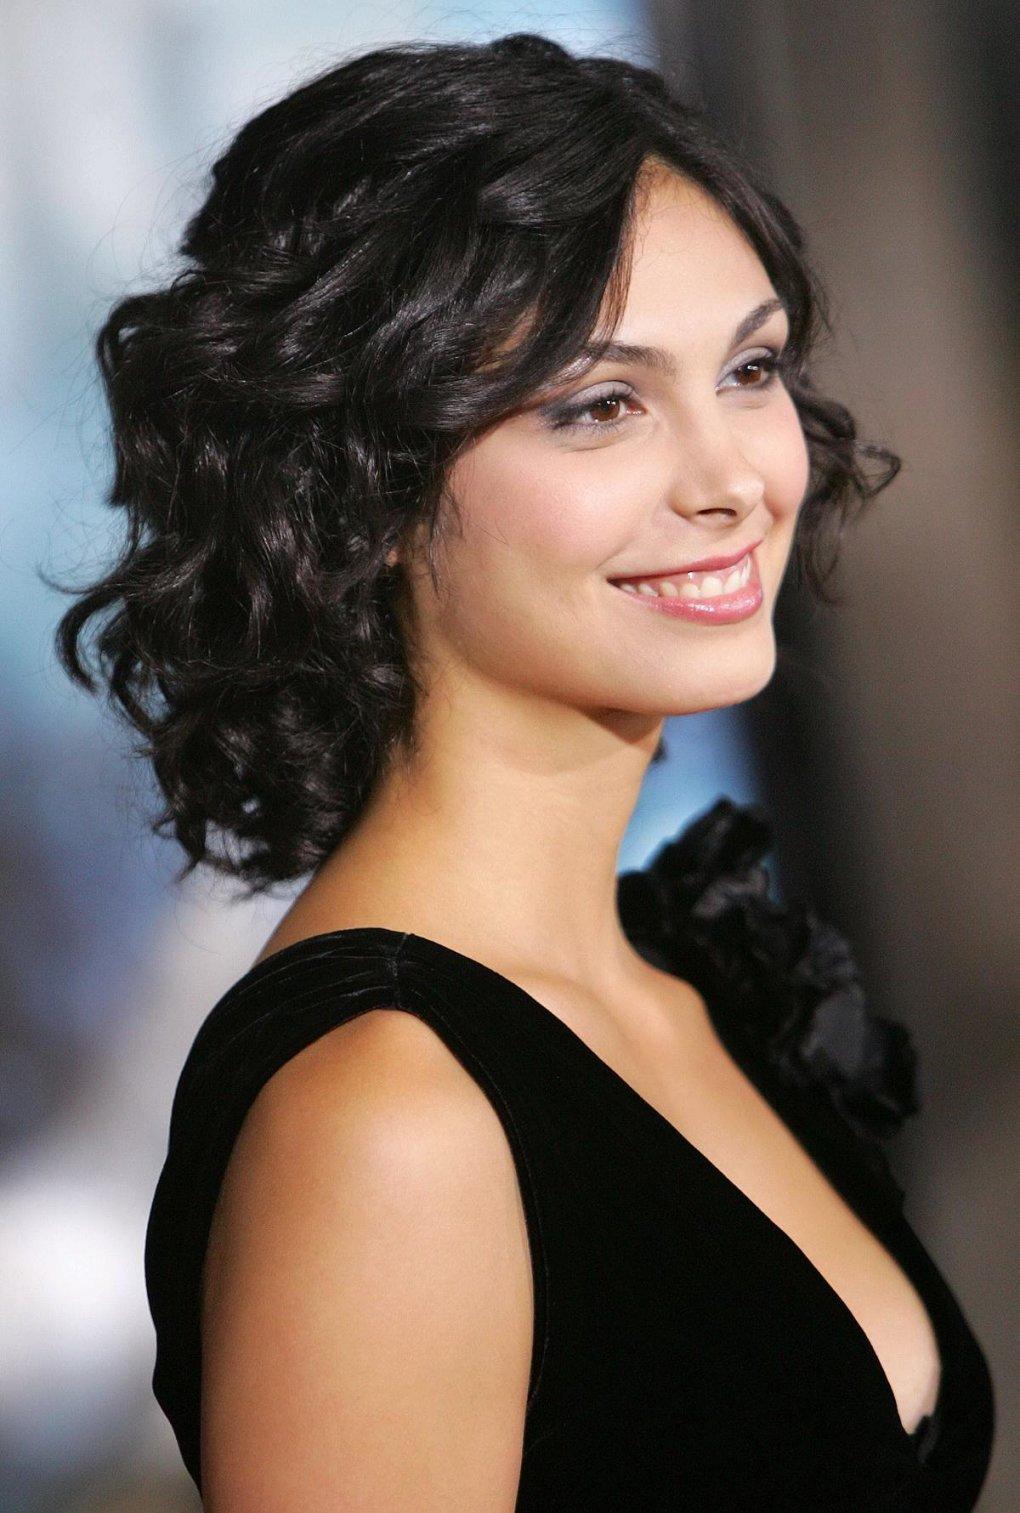 30 Sexy And Beautiful Morena Baccarin Photos Barnorama